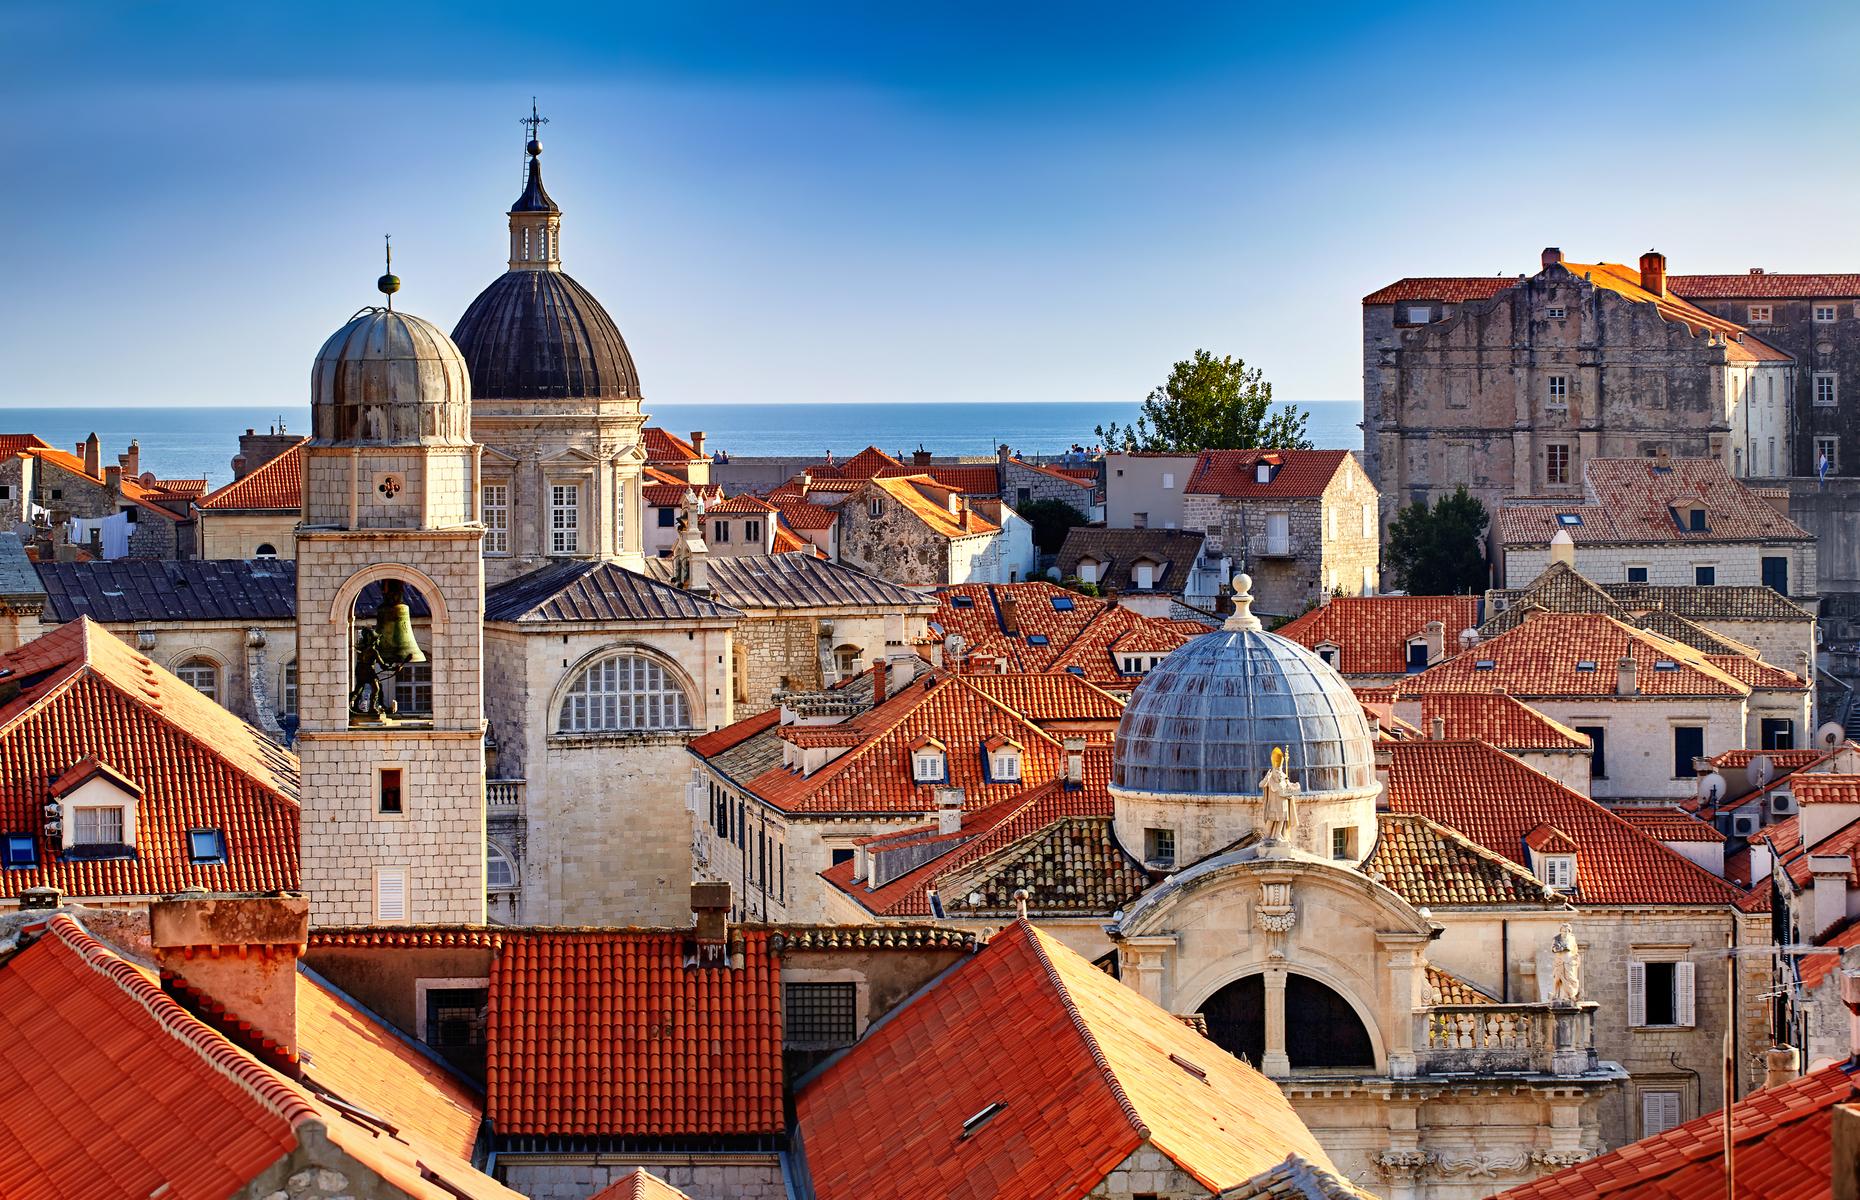 View of Dubrovnik Old Town (Image: Ihor Pasternak/Shutterstock)